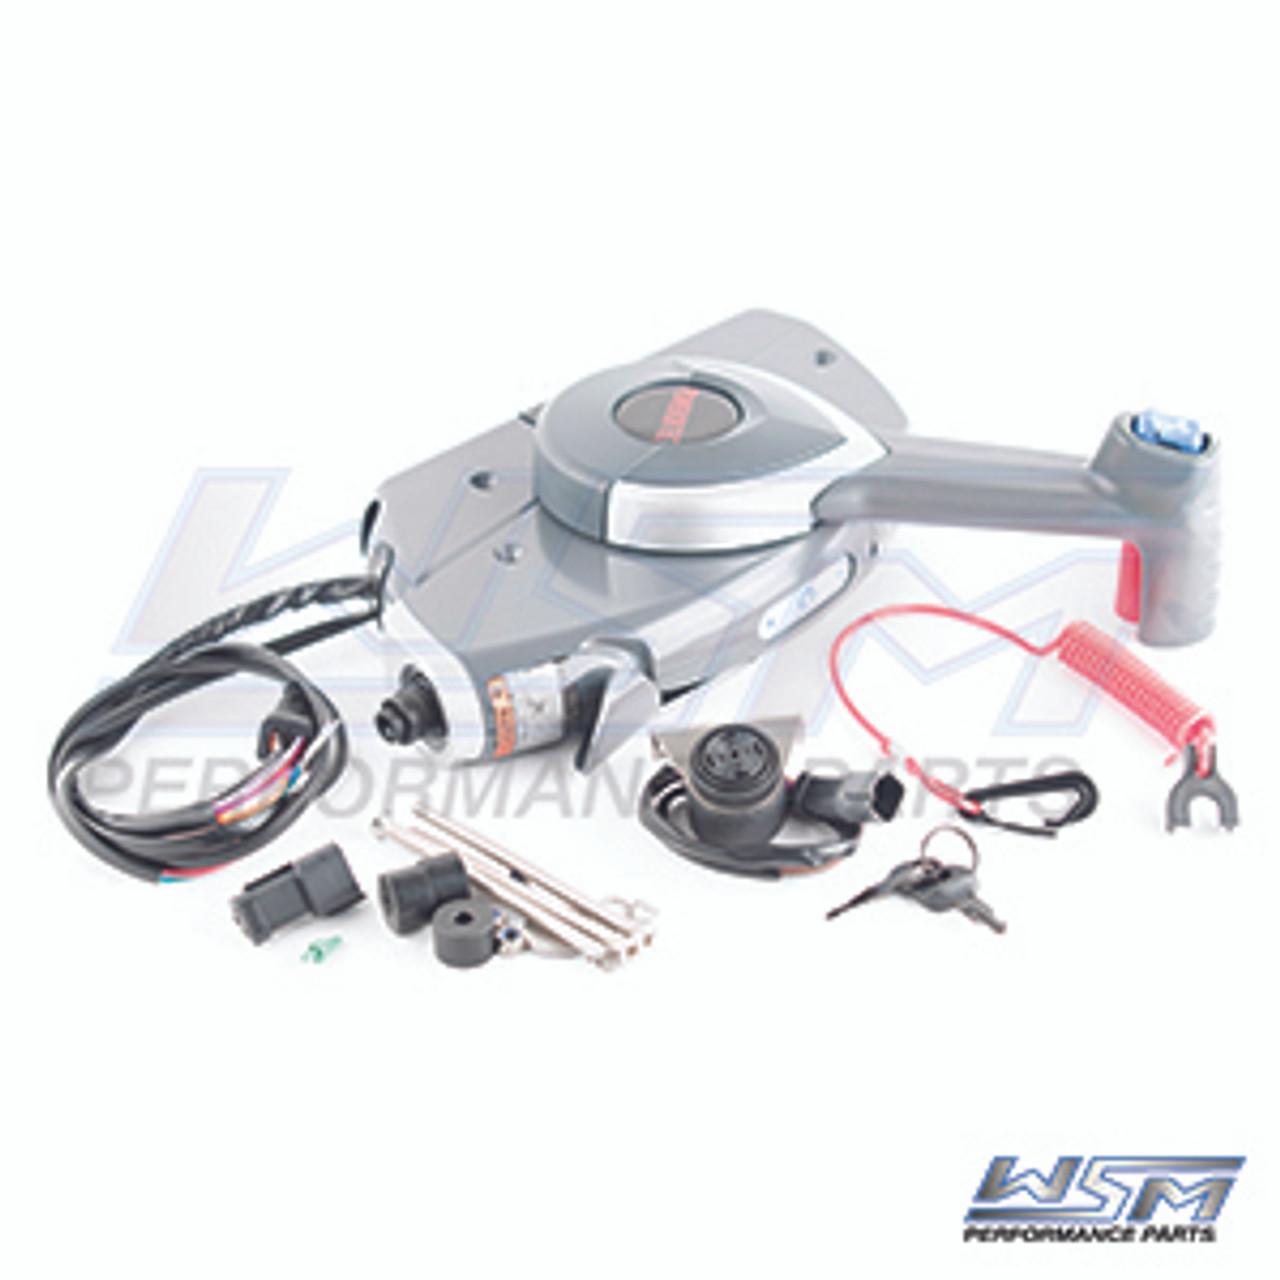 WSM Brand CONTROL BOX ASSEMBLY JOHNSON / EVINRUDE E-TEC / FICHT